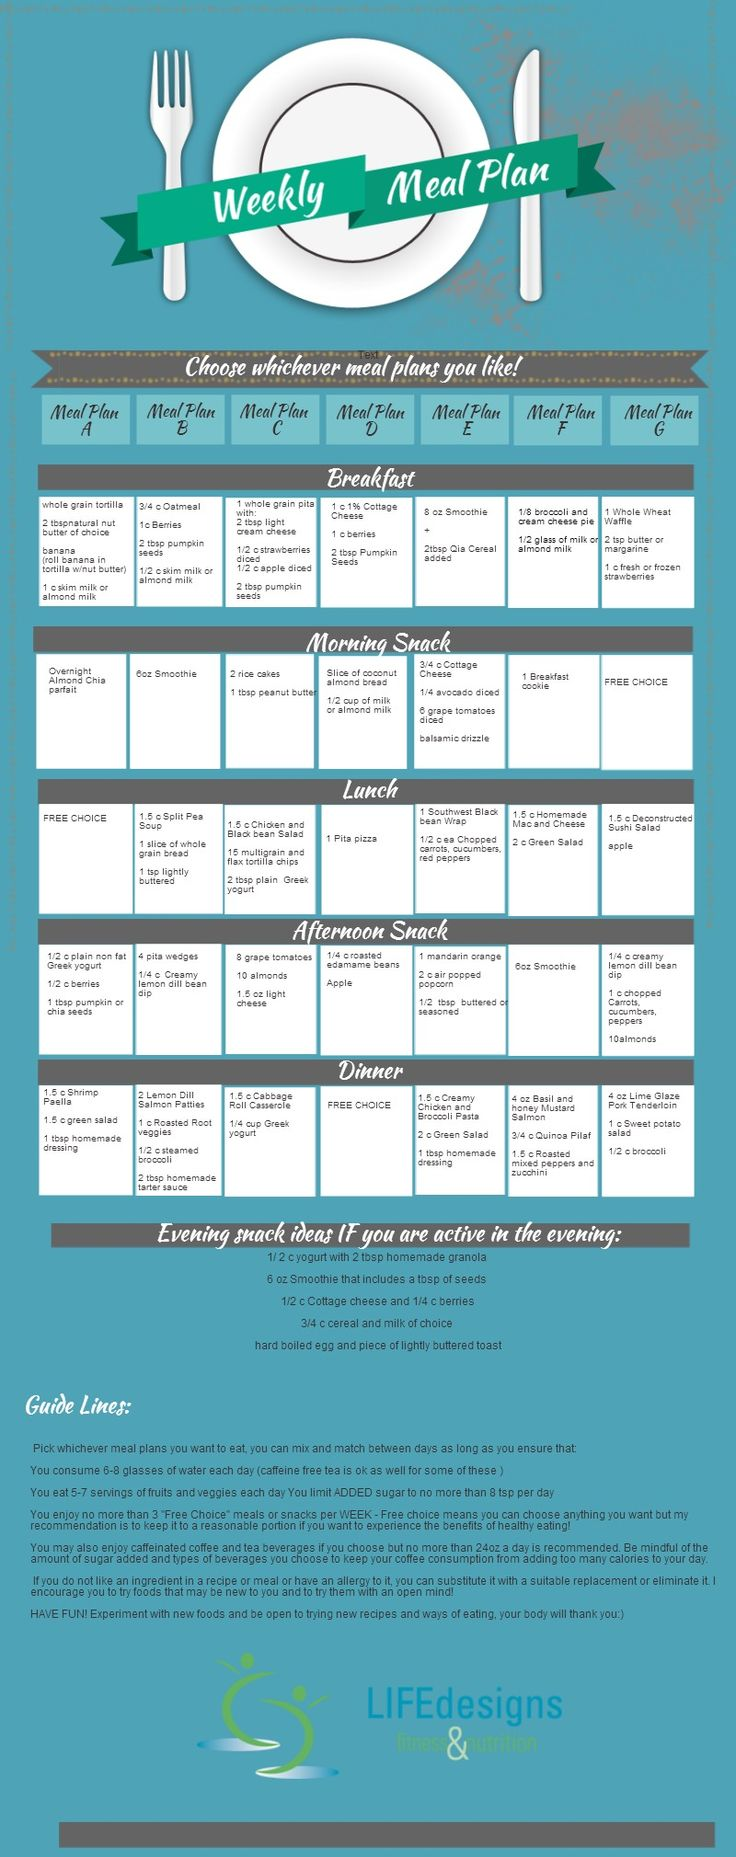 Meal Plan Week  4   Piktochart Infographic Editor